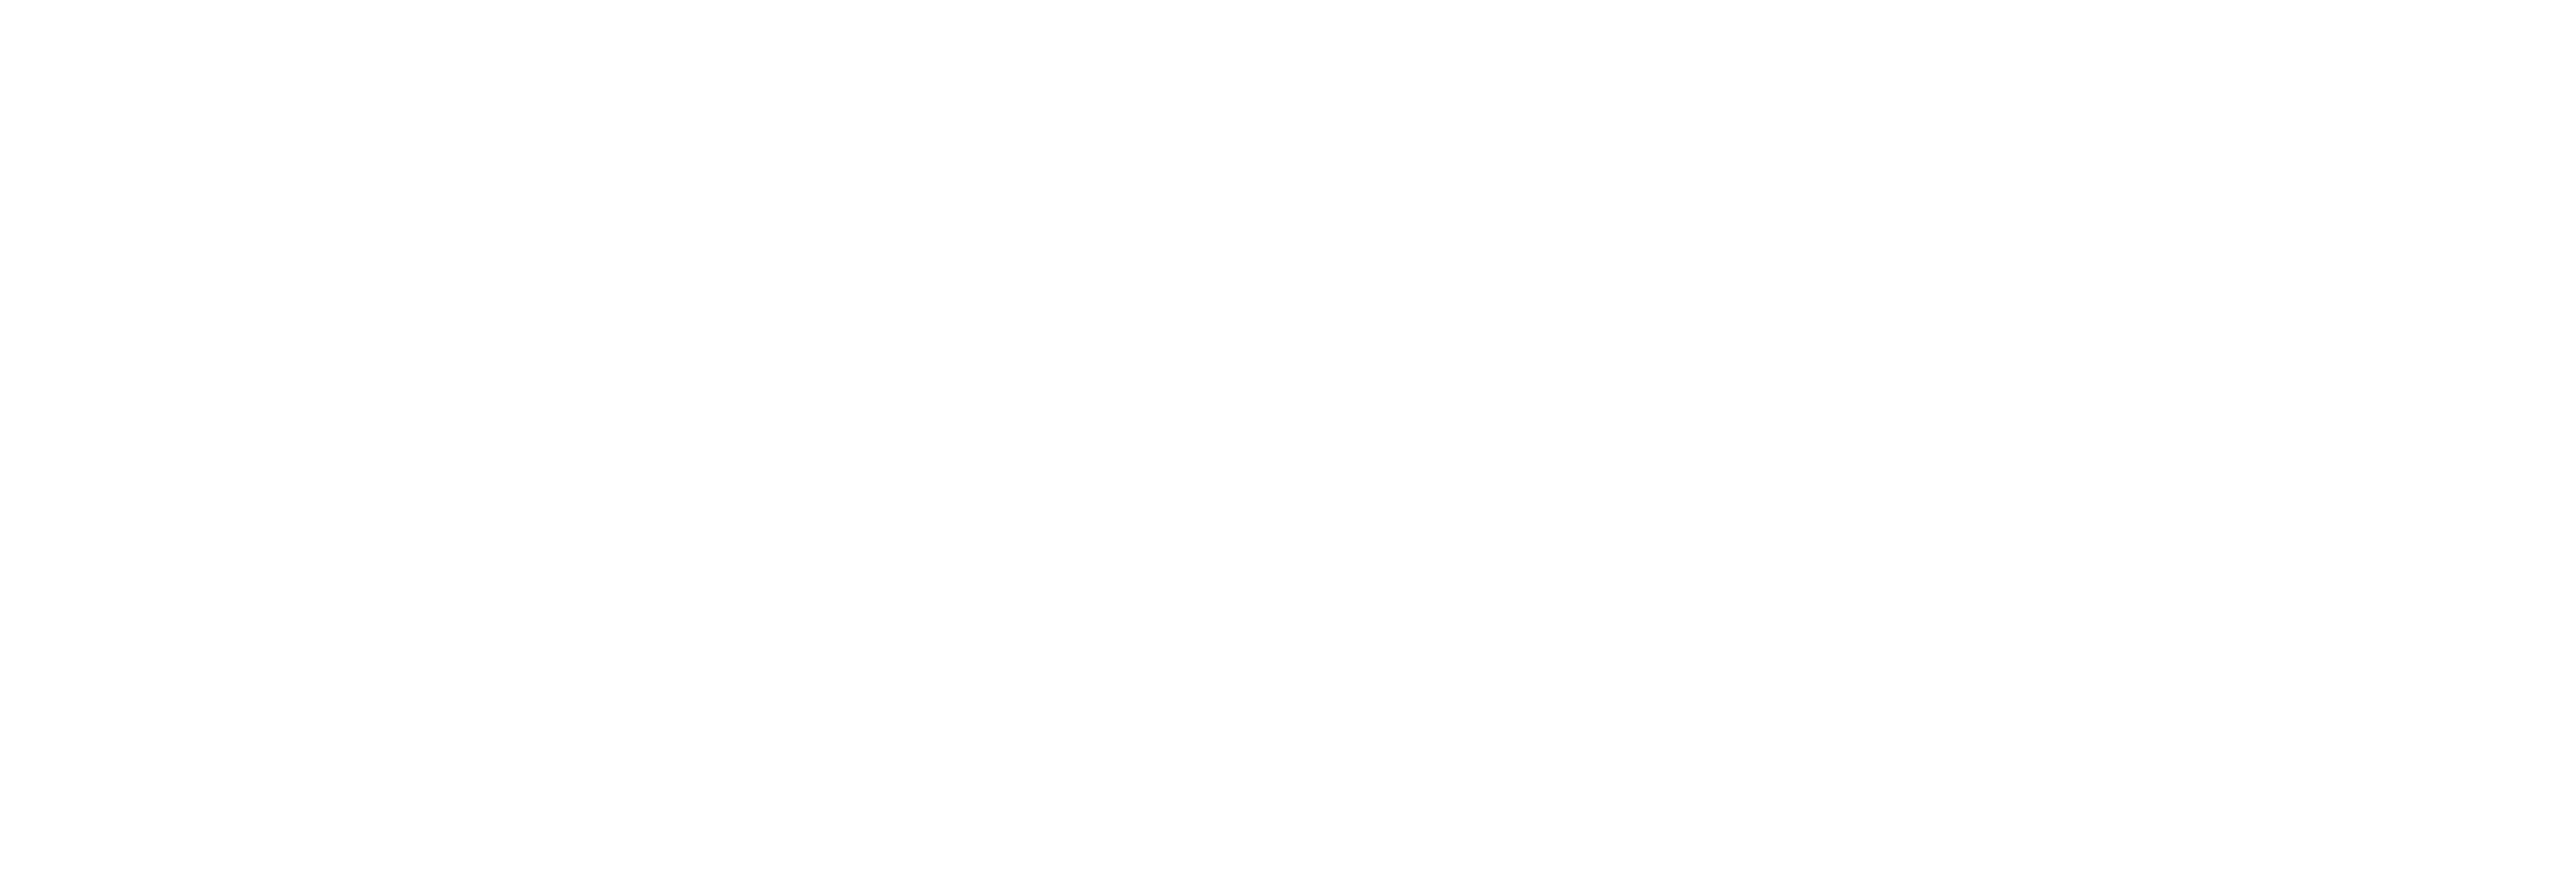 THE CARBAYA BLOG